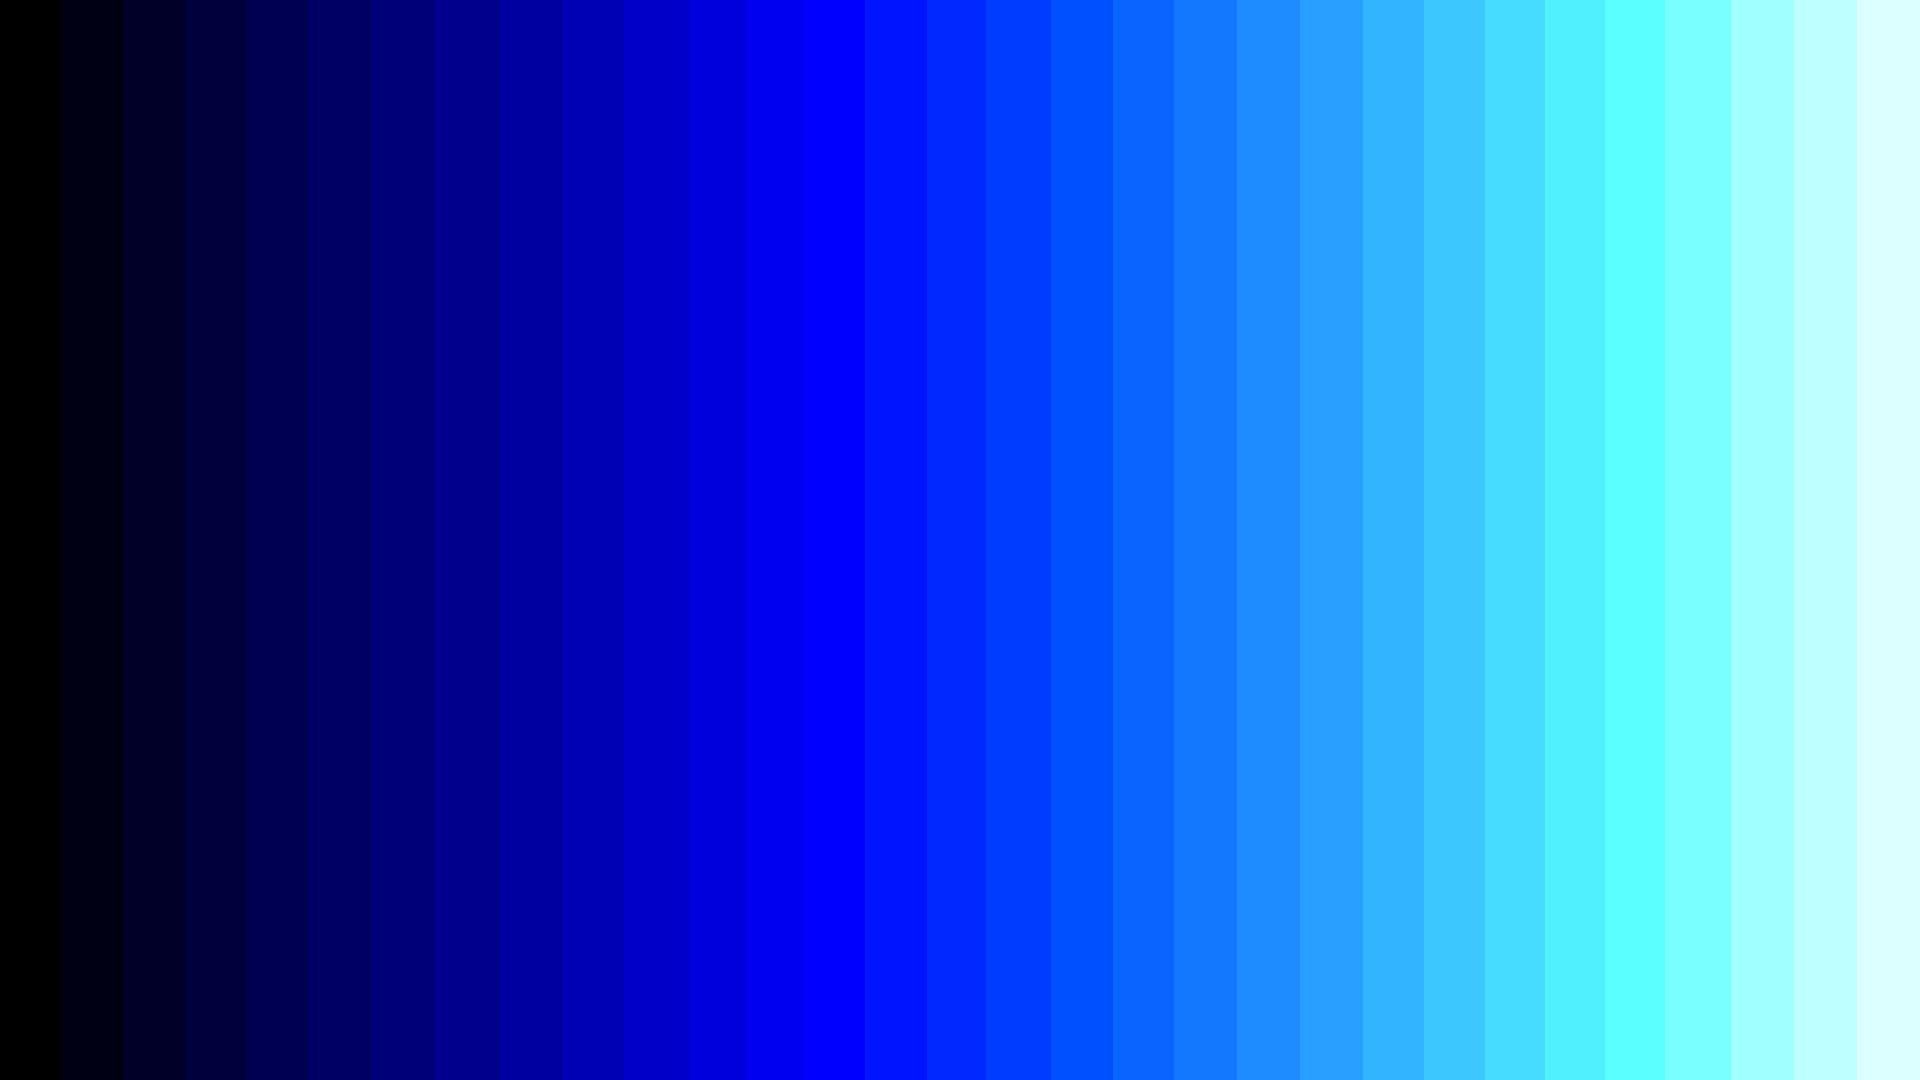 Color Blue Gradient - HD Wallpaper